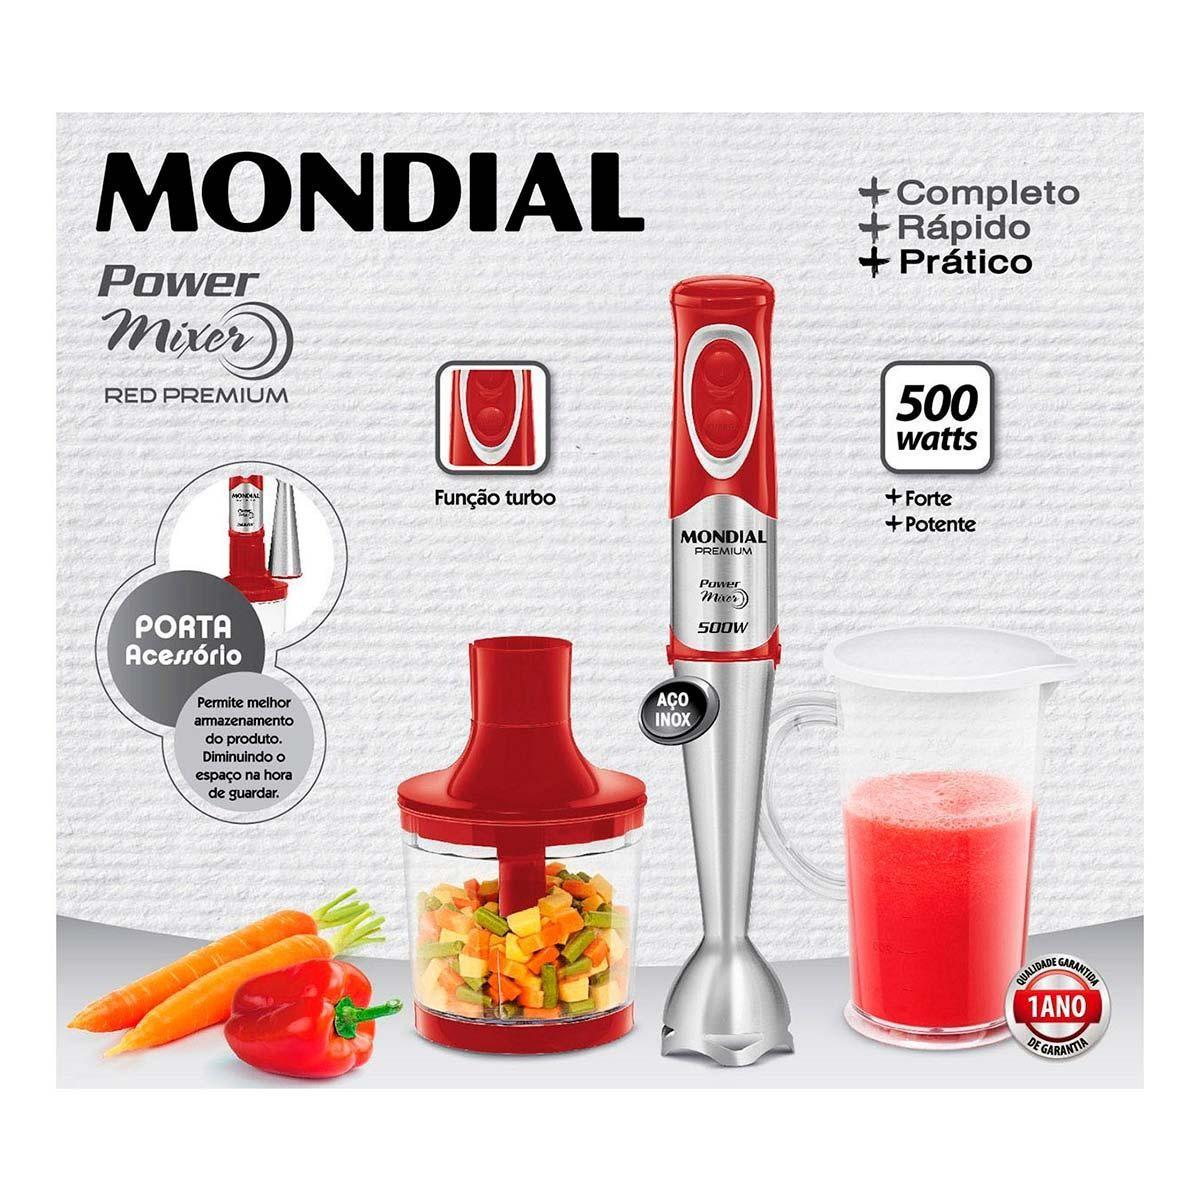 M-10 - Power Mixer RED Premium - Mondial - 110v